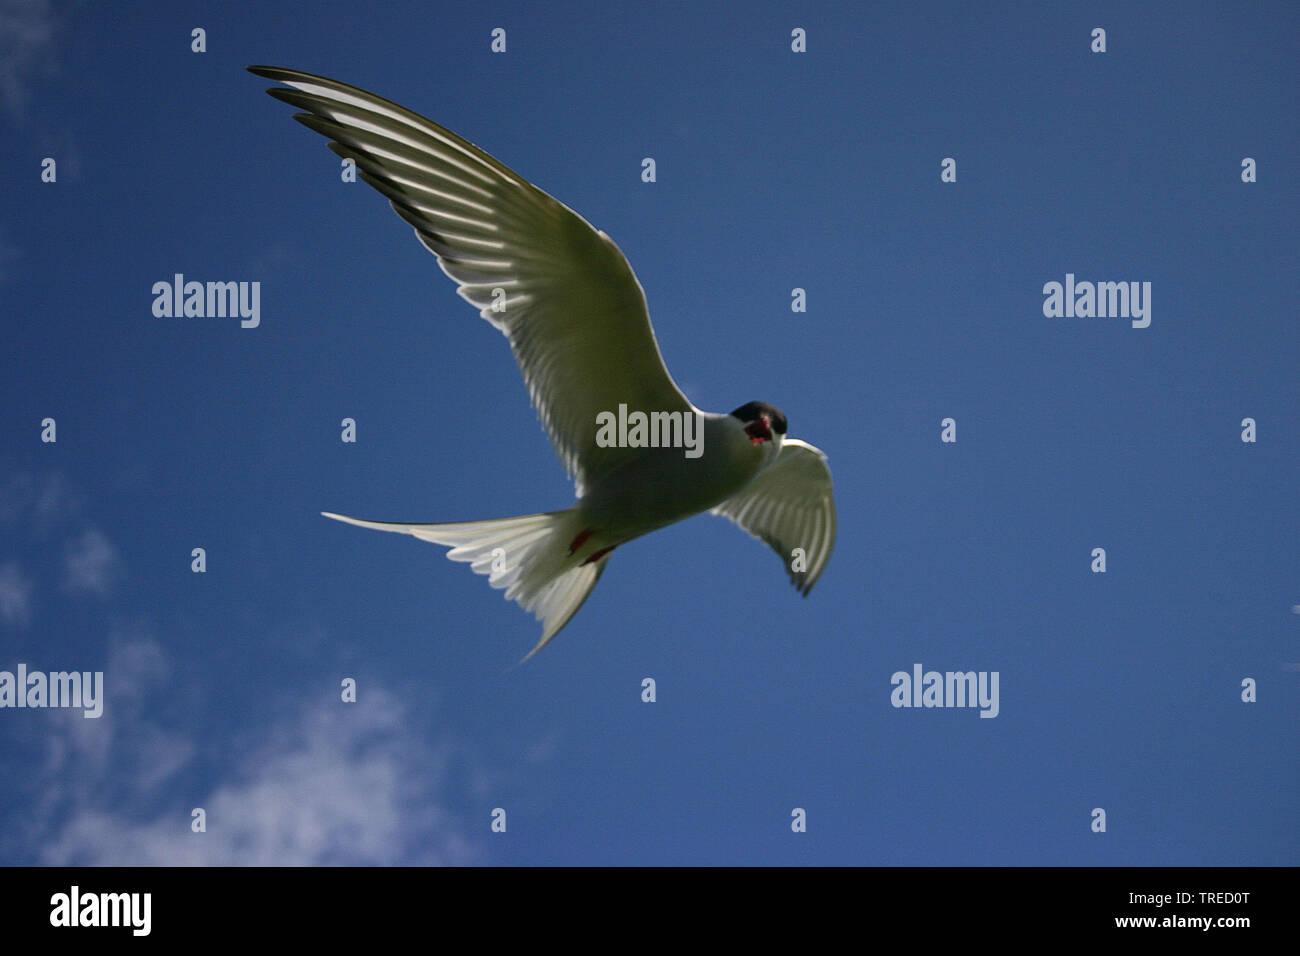 Kuestenseeschwalbe, Kuesten-Seeschwalbe (Sterna paradisaea), im Flug am blauen Himmel, Grossbritannien, England, Northumberland, Farne Islands | arcti - Stock Image